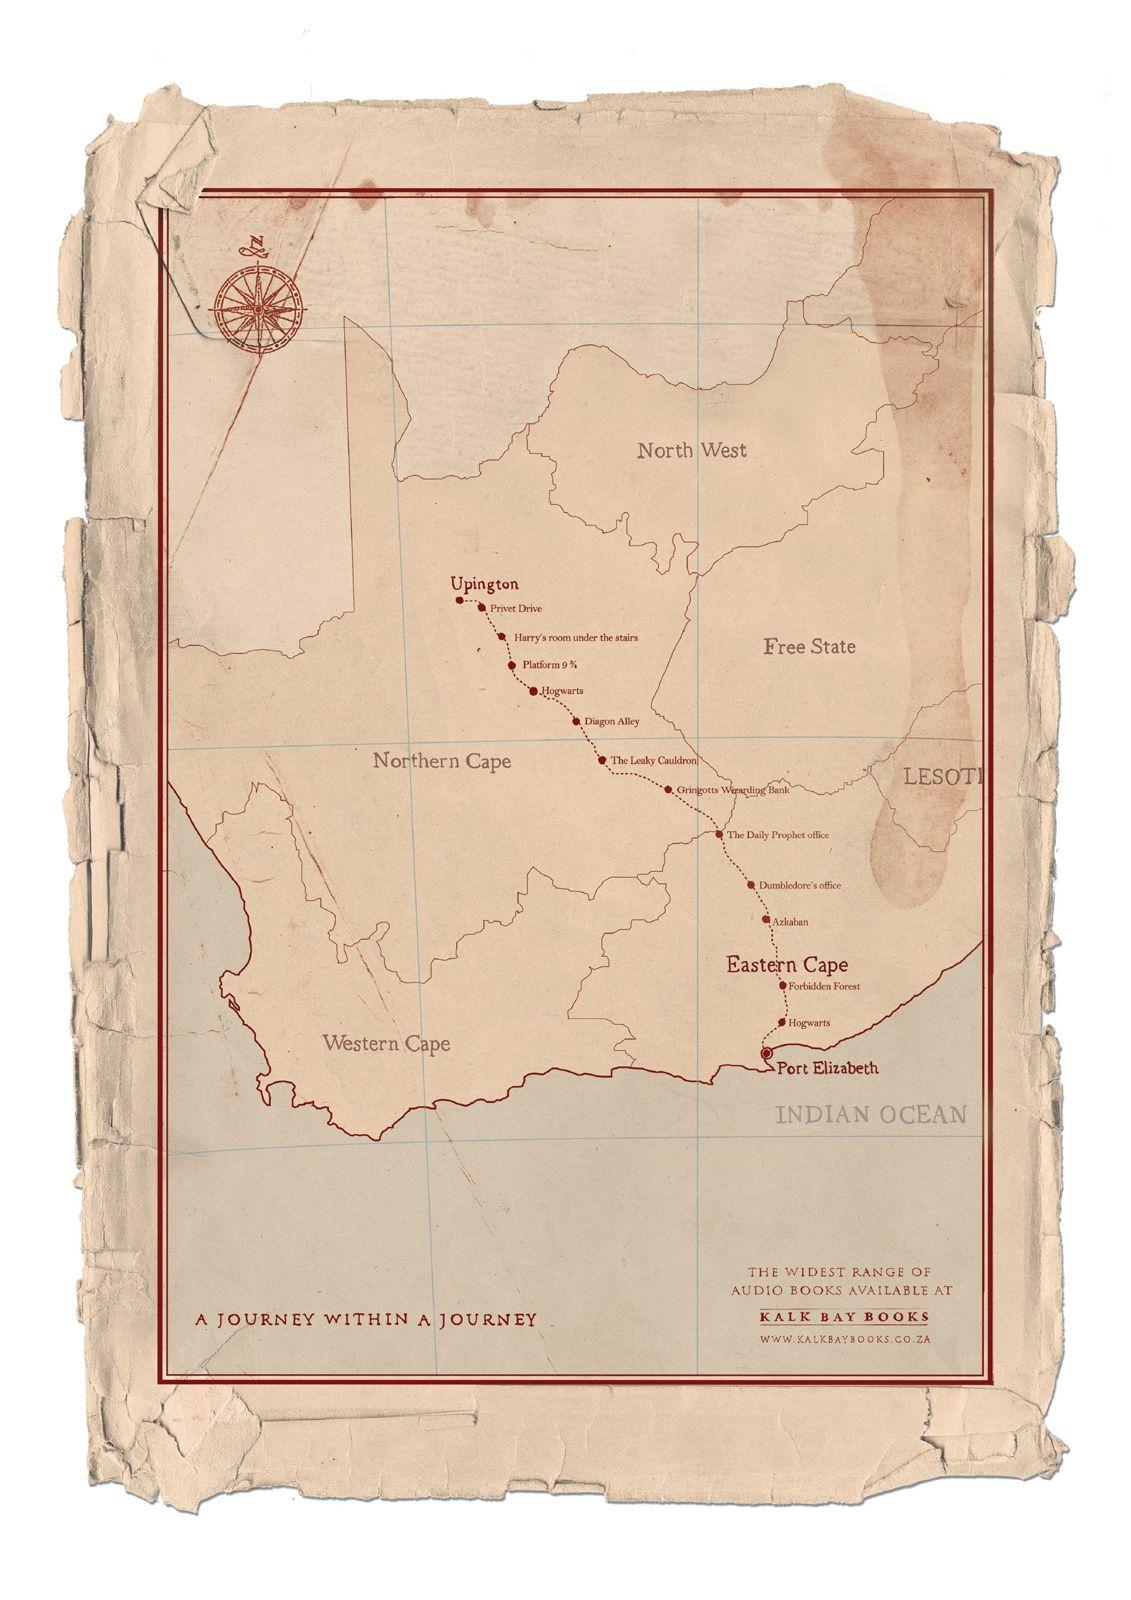 "Kalk Bay Books: Audio Books Journey, 1 - ""A journey within a journey"" / Ireland / Davenport, Johannesburg, South Africa (March 2011)"